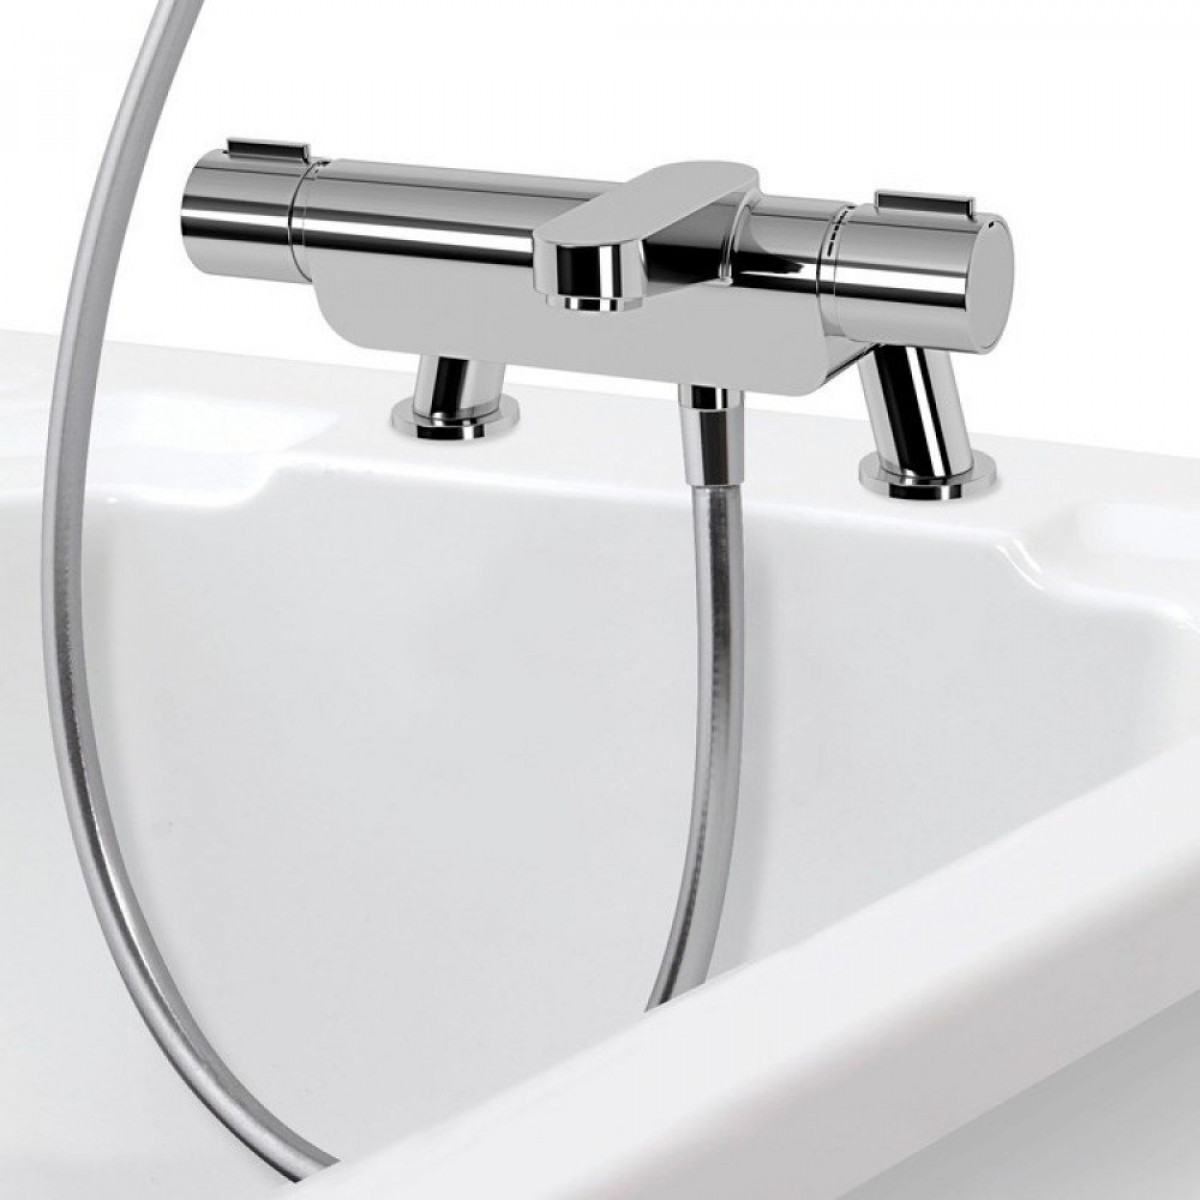 aqualisa midas 220 bath shower mixer md220bsm aqualisa midas 100 thermostatic bath amp shower mixer